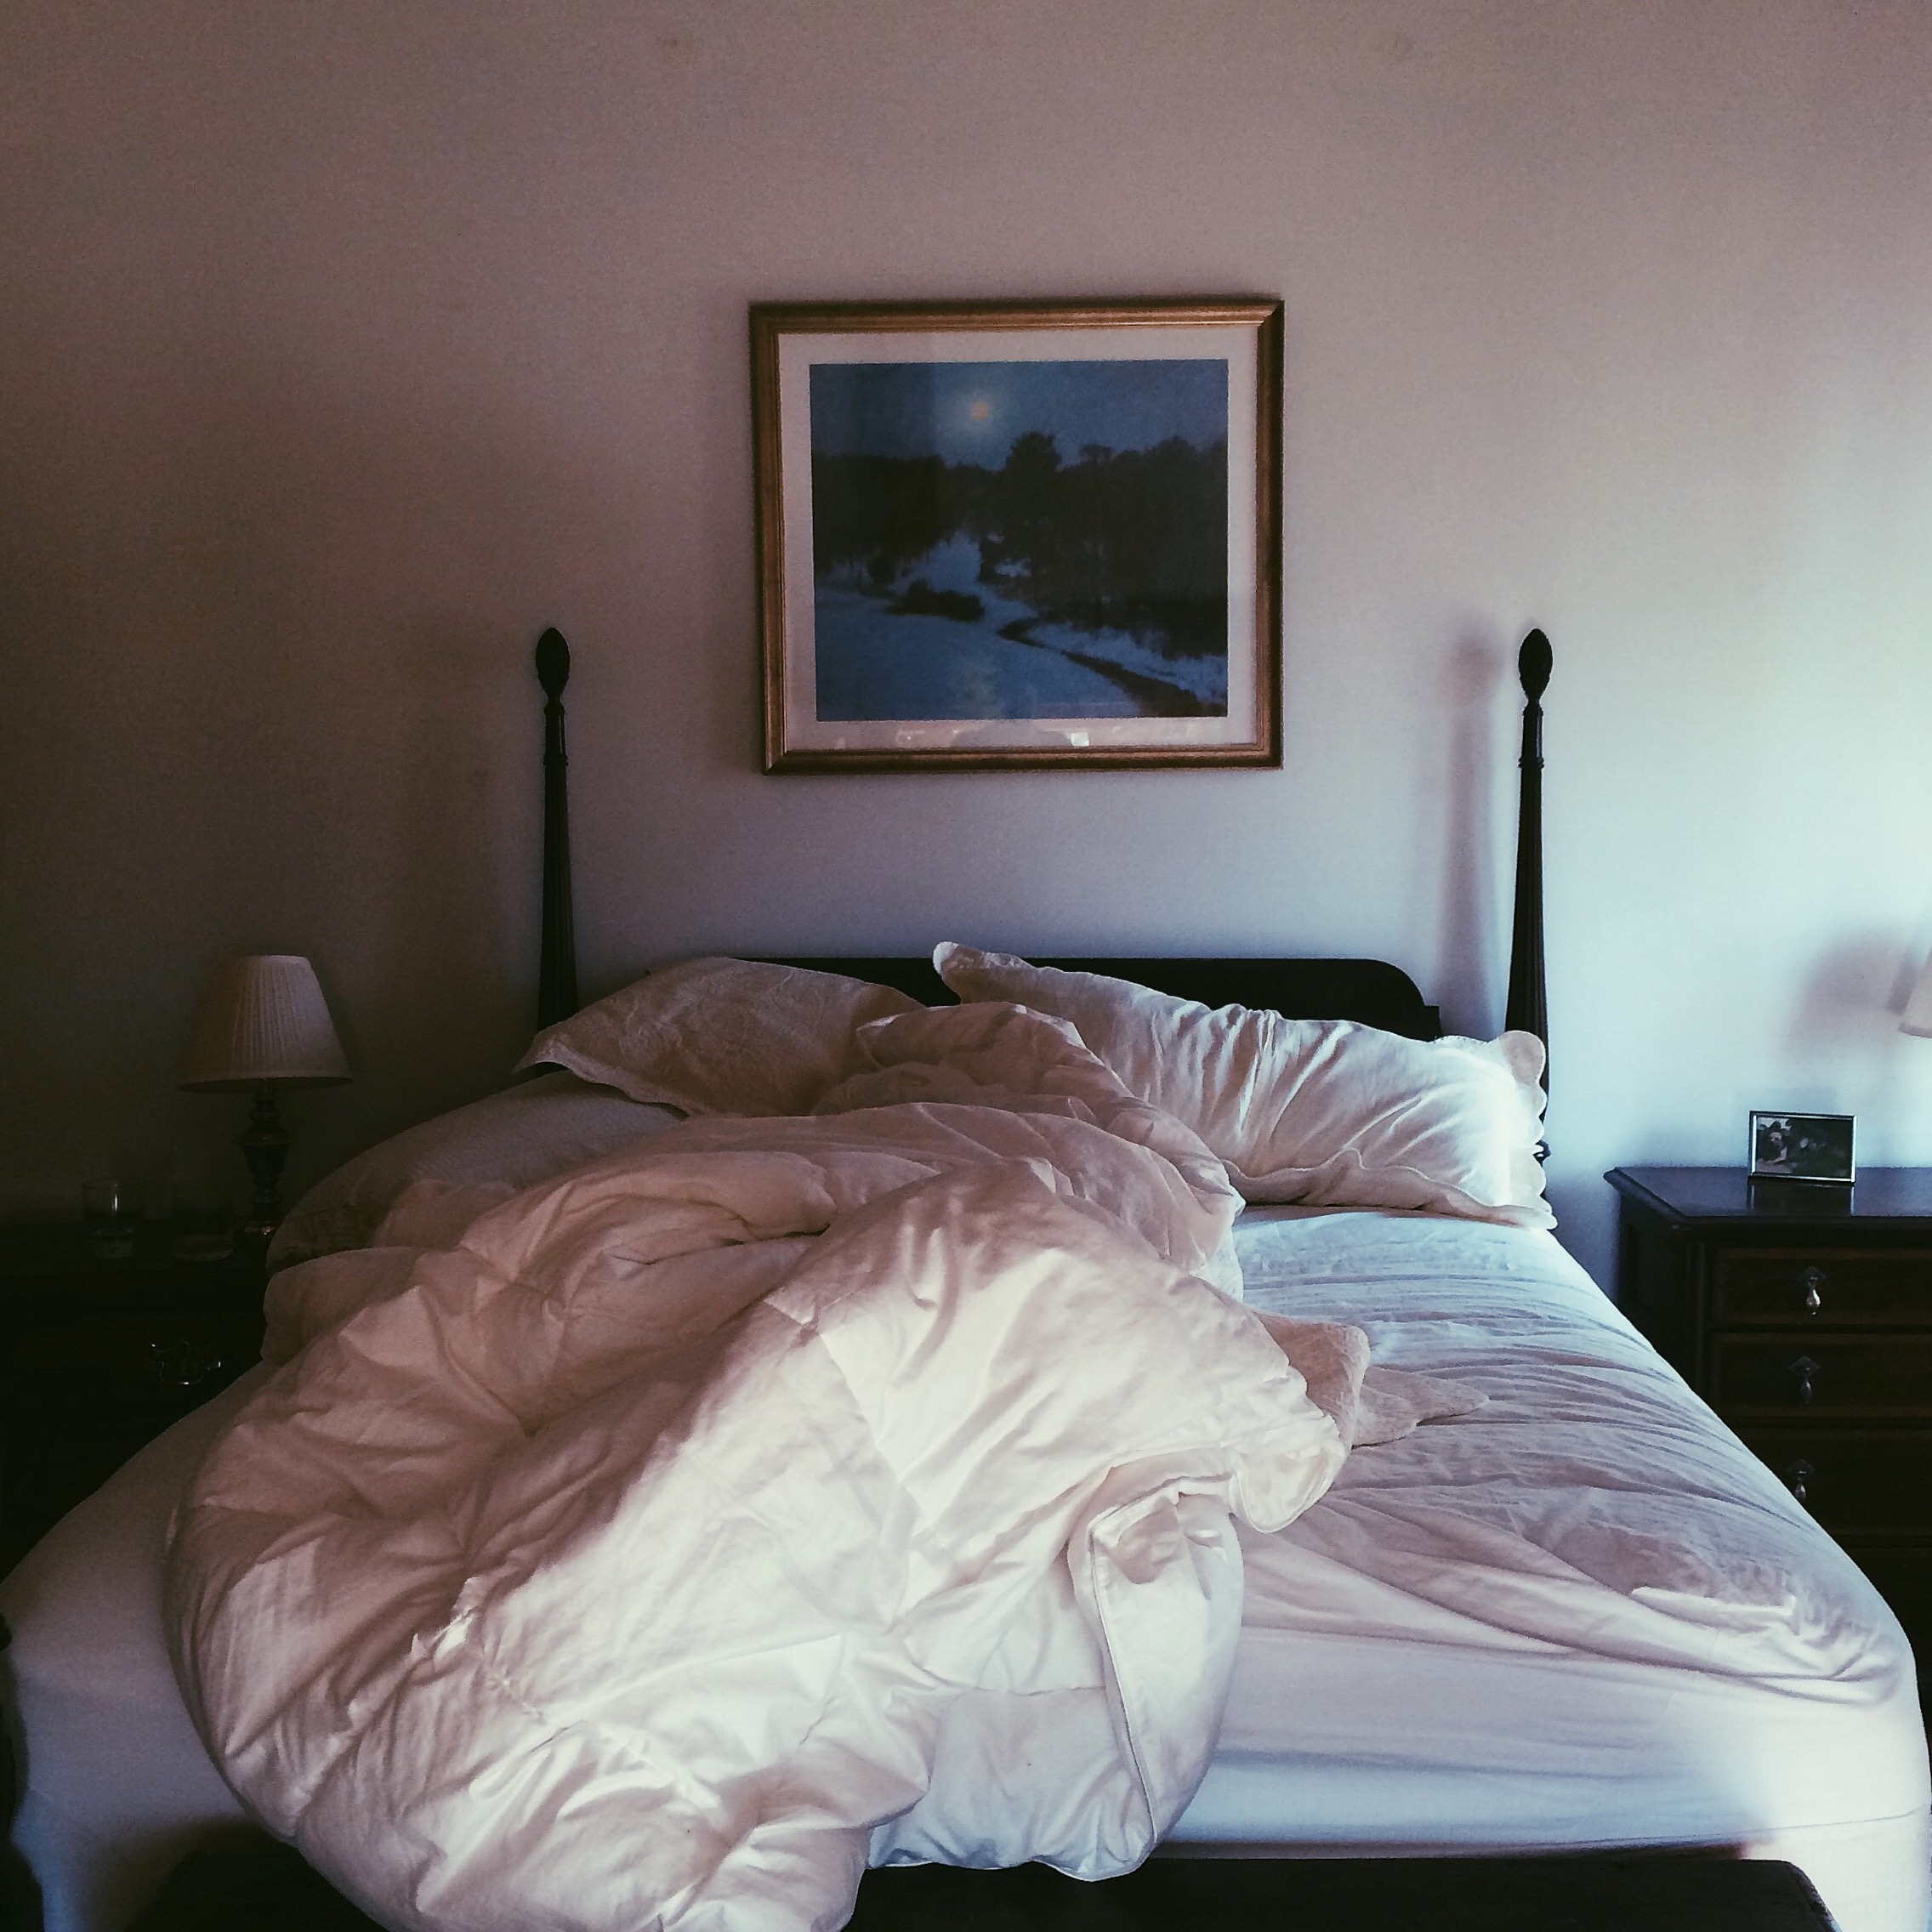 Kiki's bed. Litchfield, CT. November 2014.